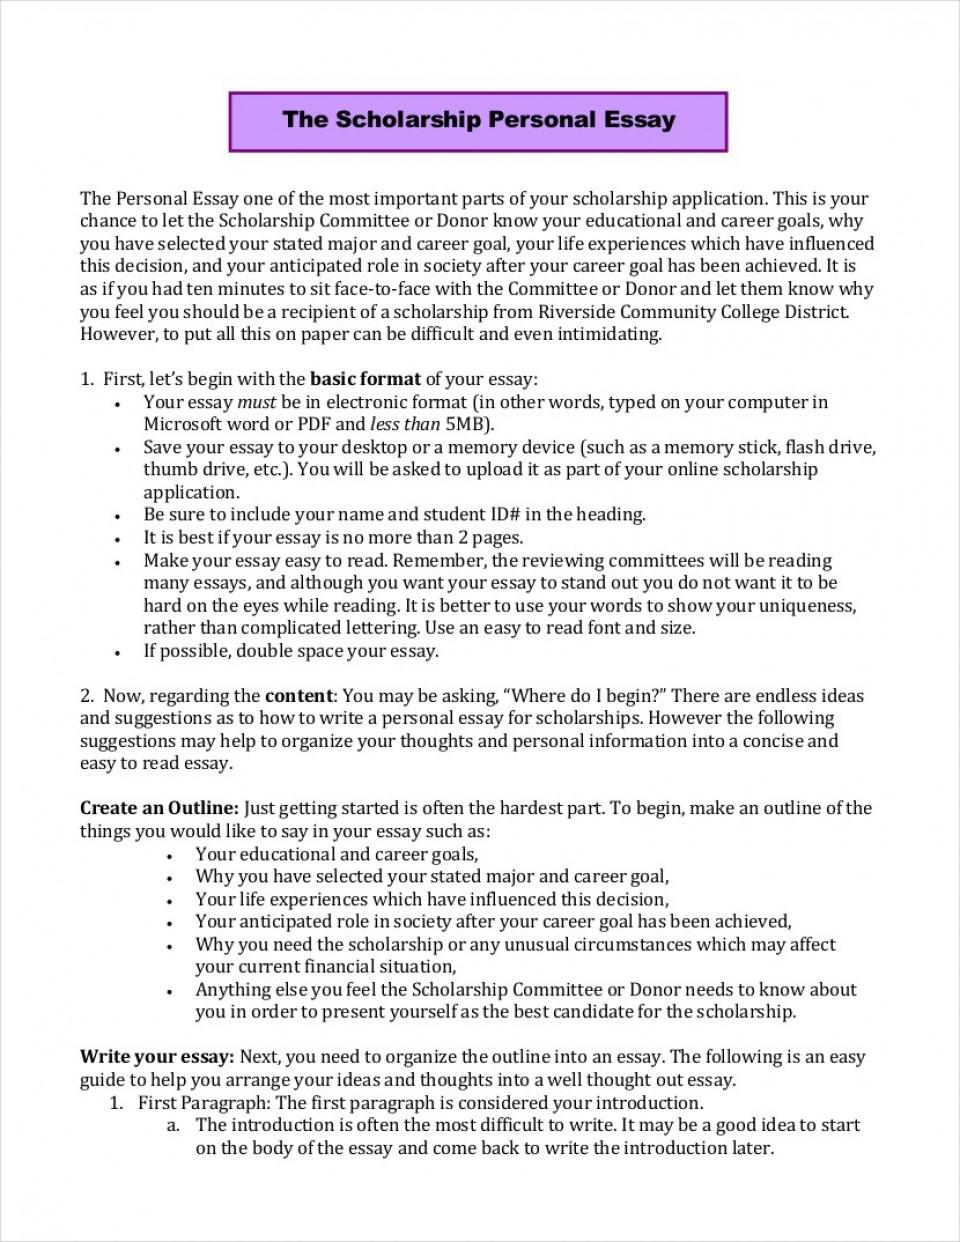 Argumentative essay identity theft